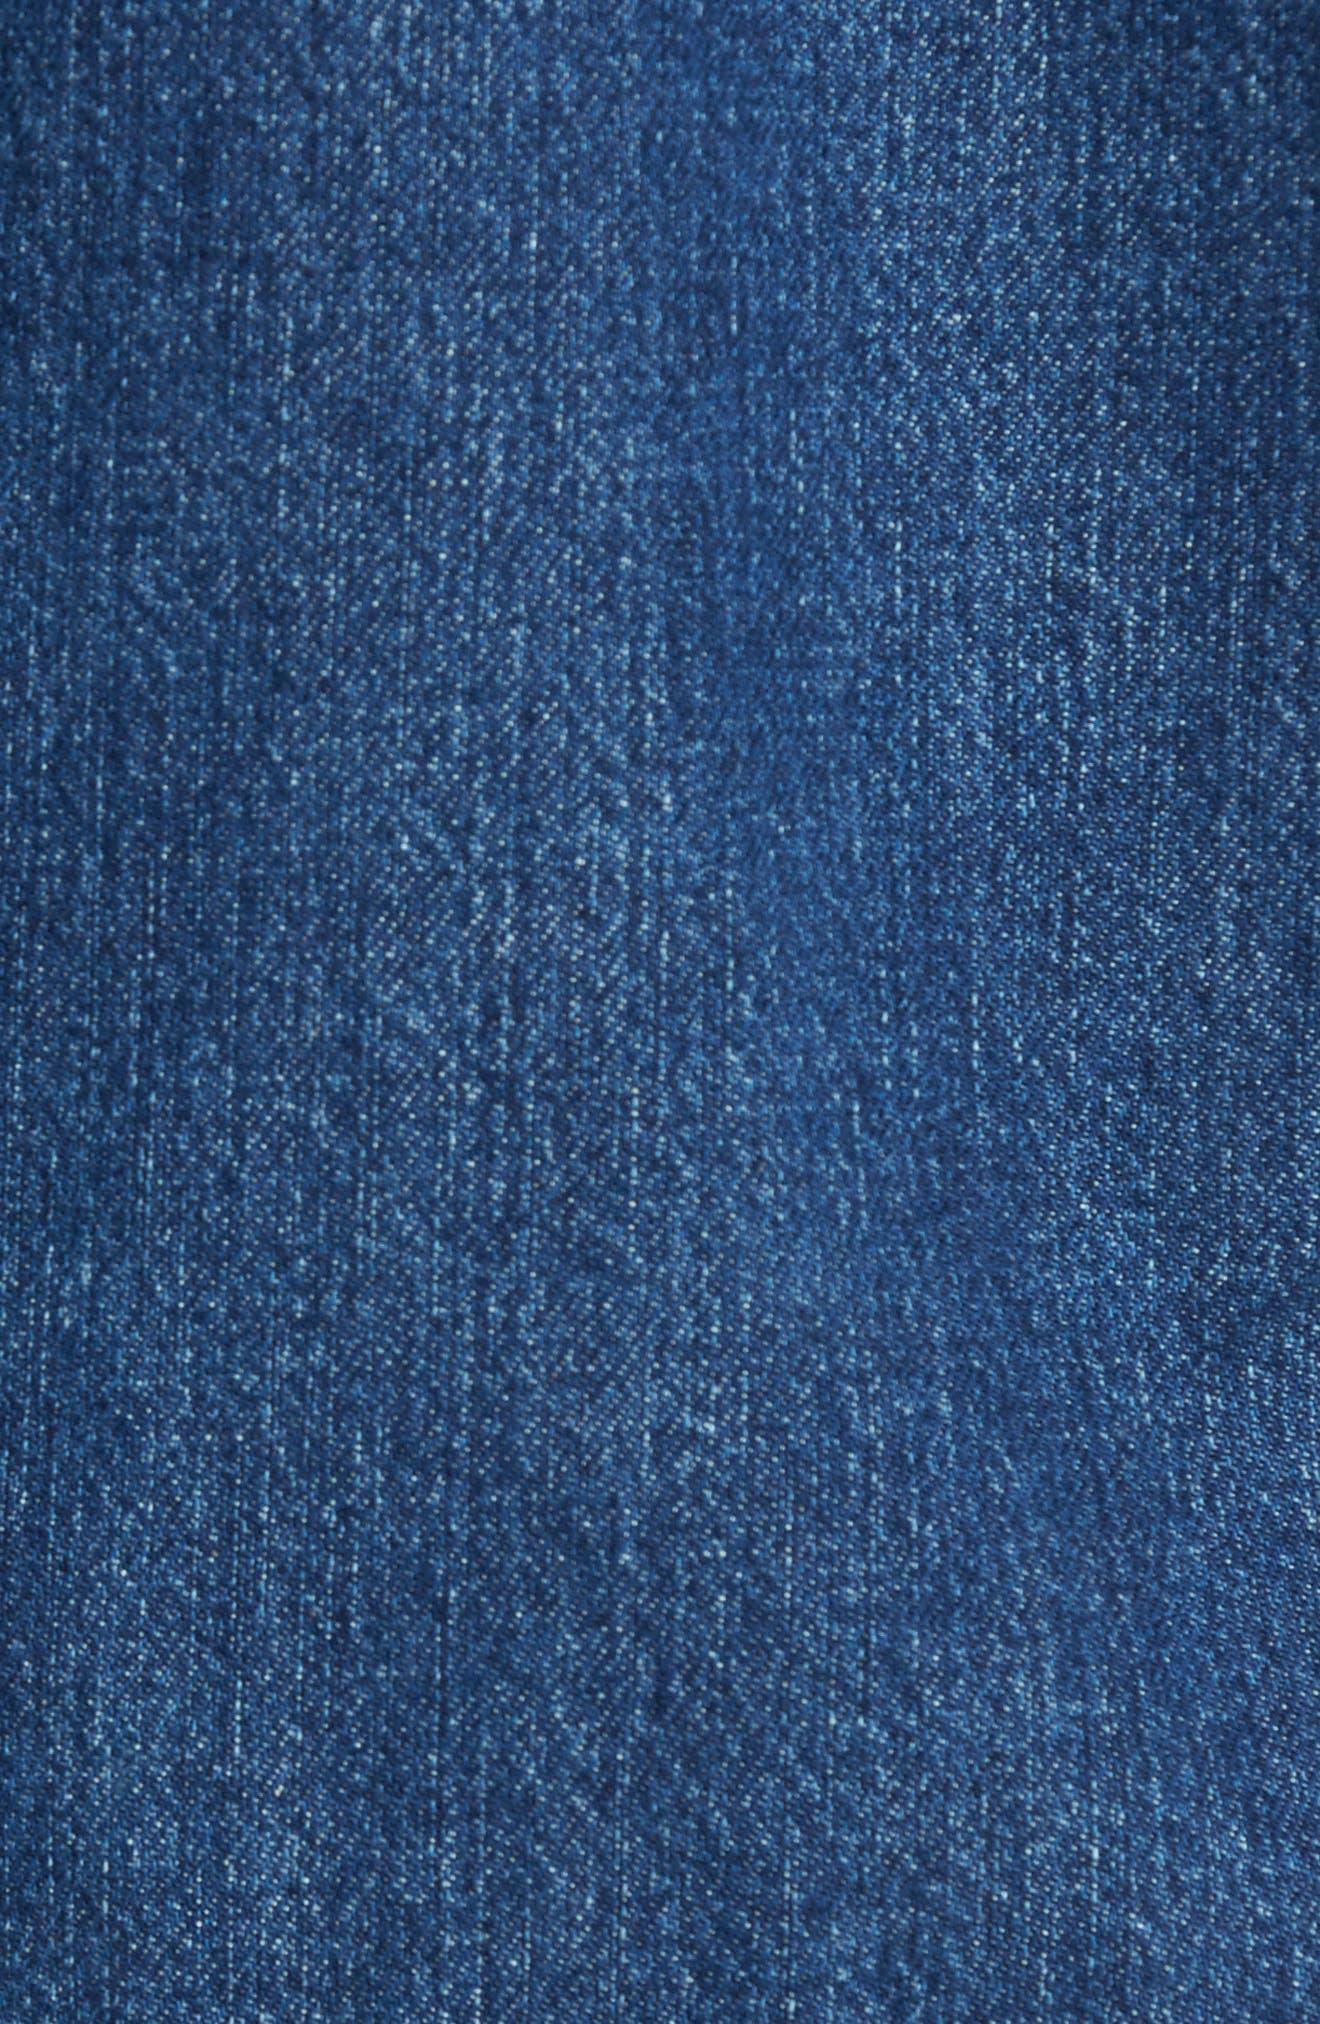 Gorn Denim Jacket,                             Alternate thumbnail 5, color,                             475